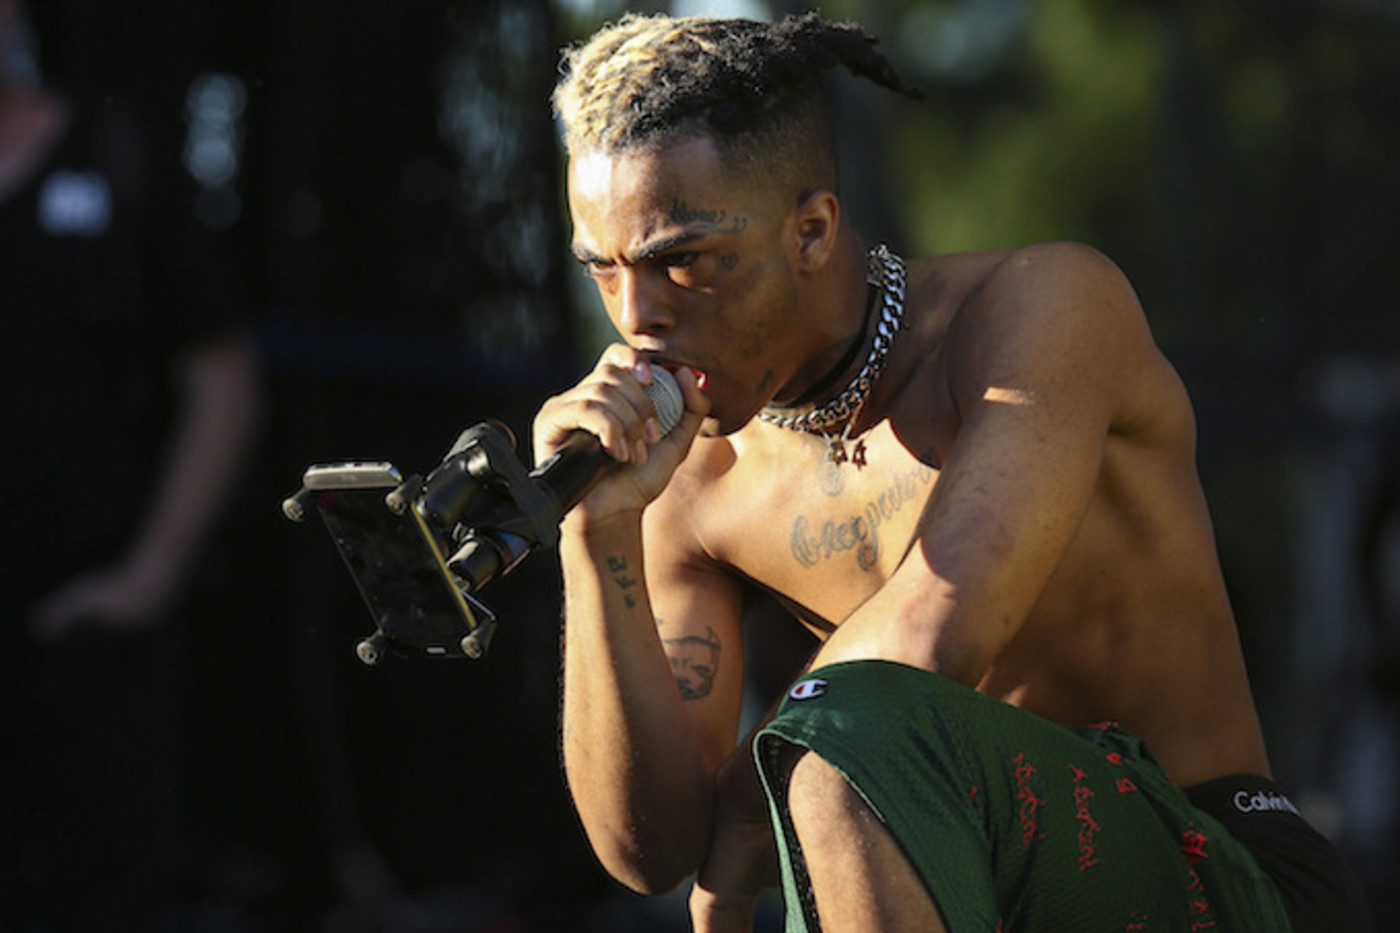 XXXTentacion performing in Miami